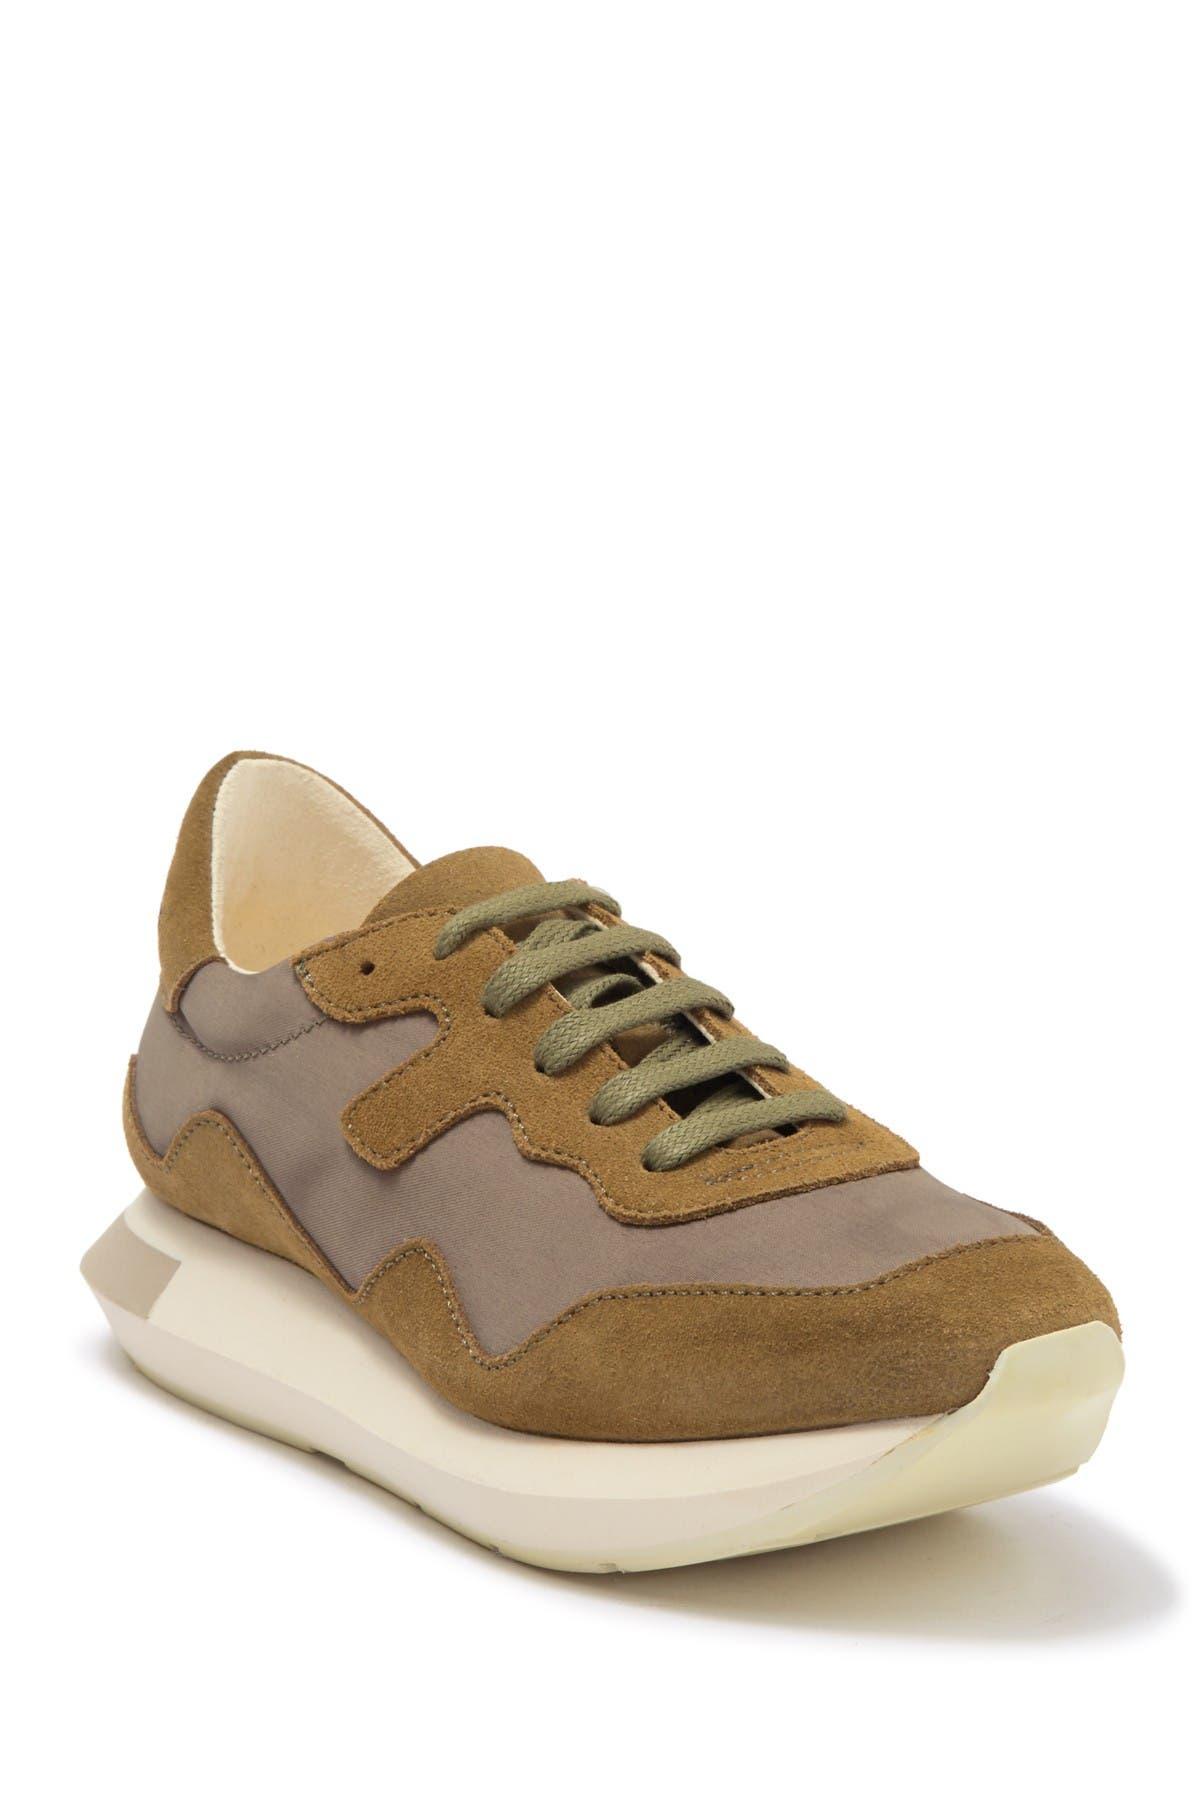 Image of Paloma Barcelo Merli Fashion Sneaker